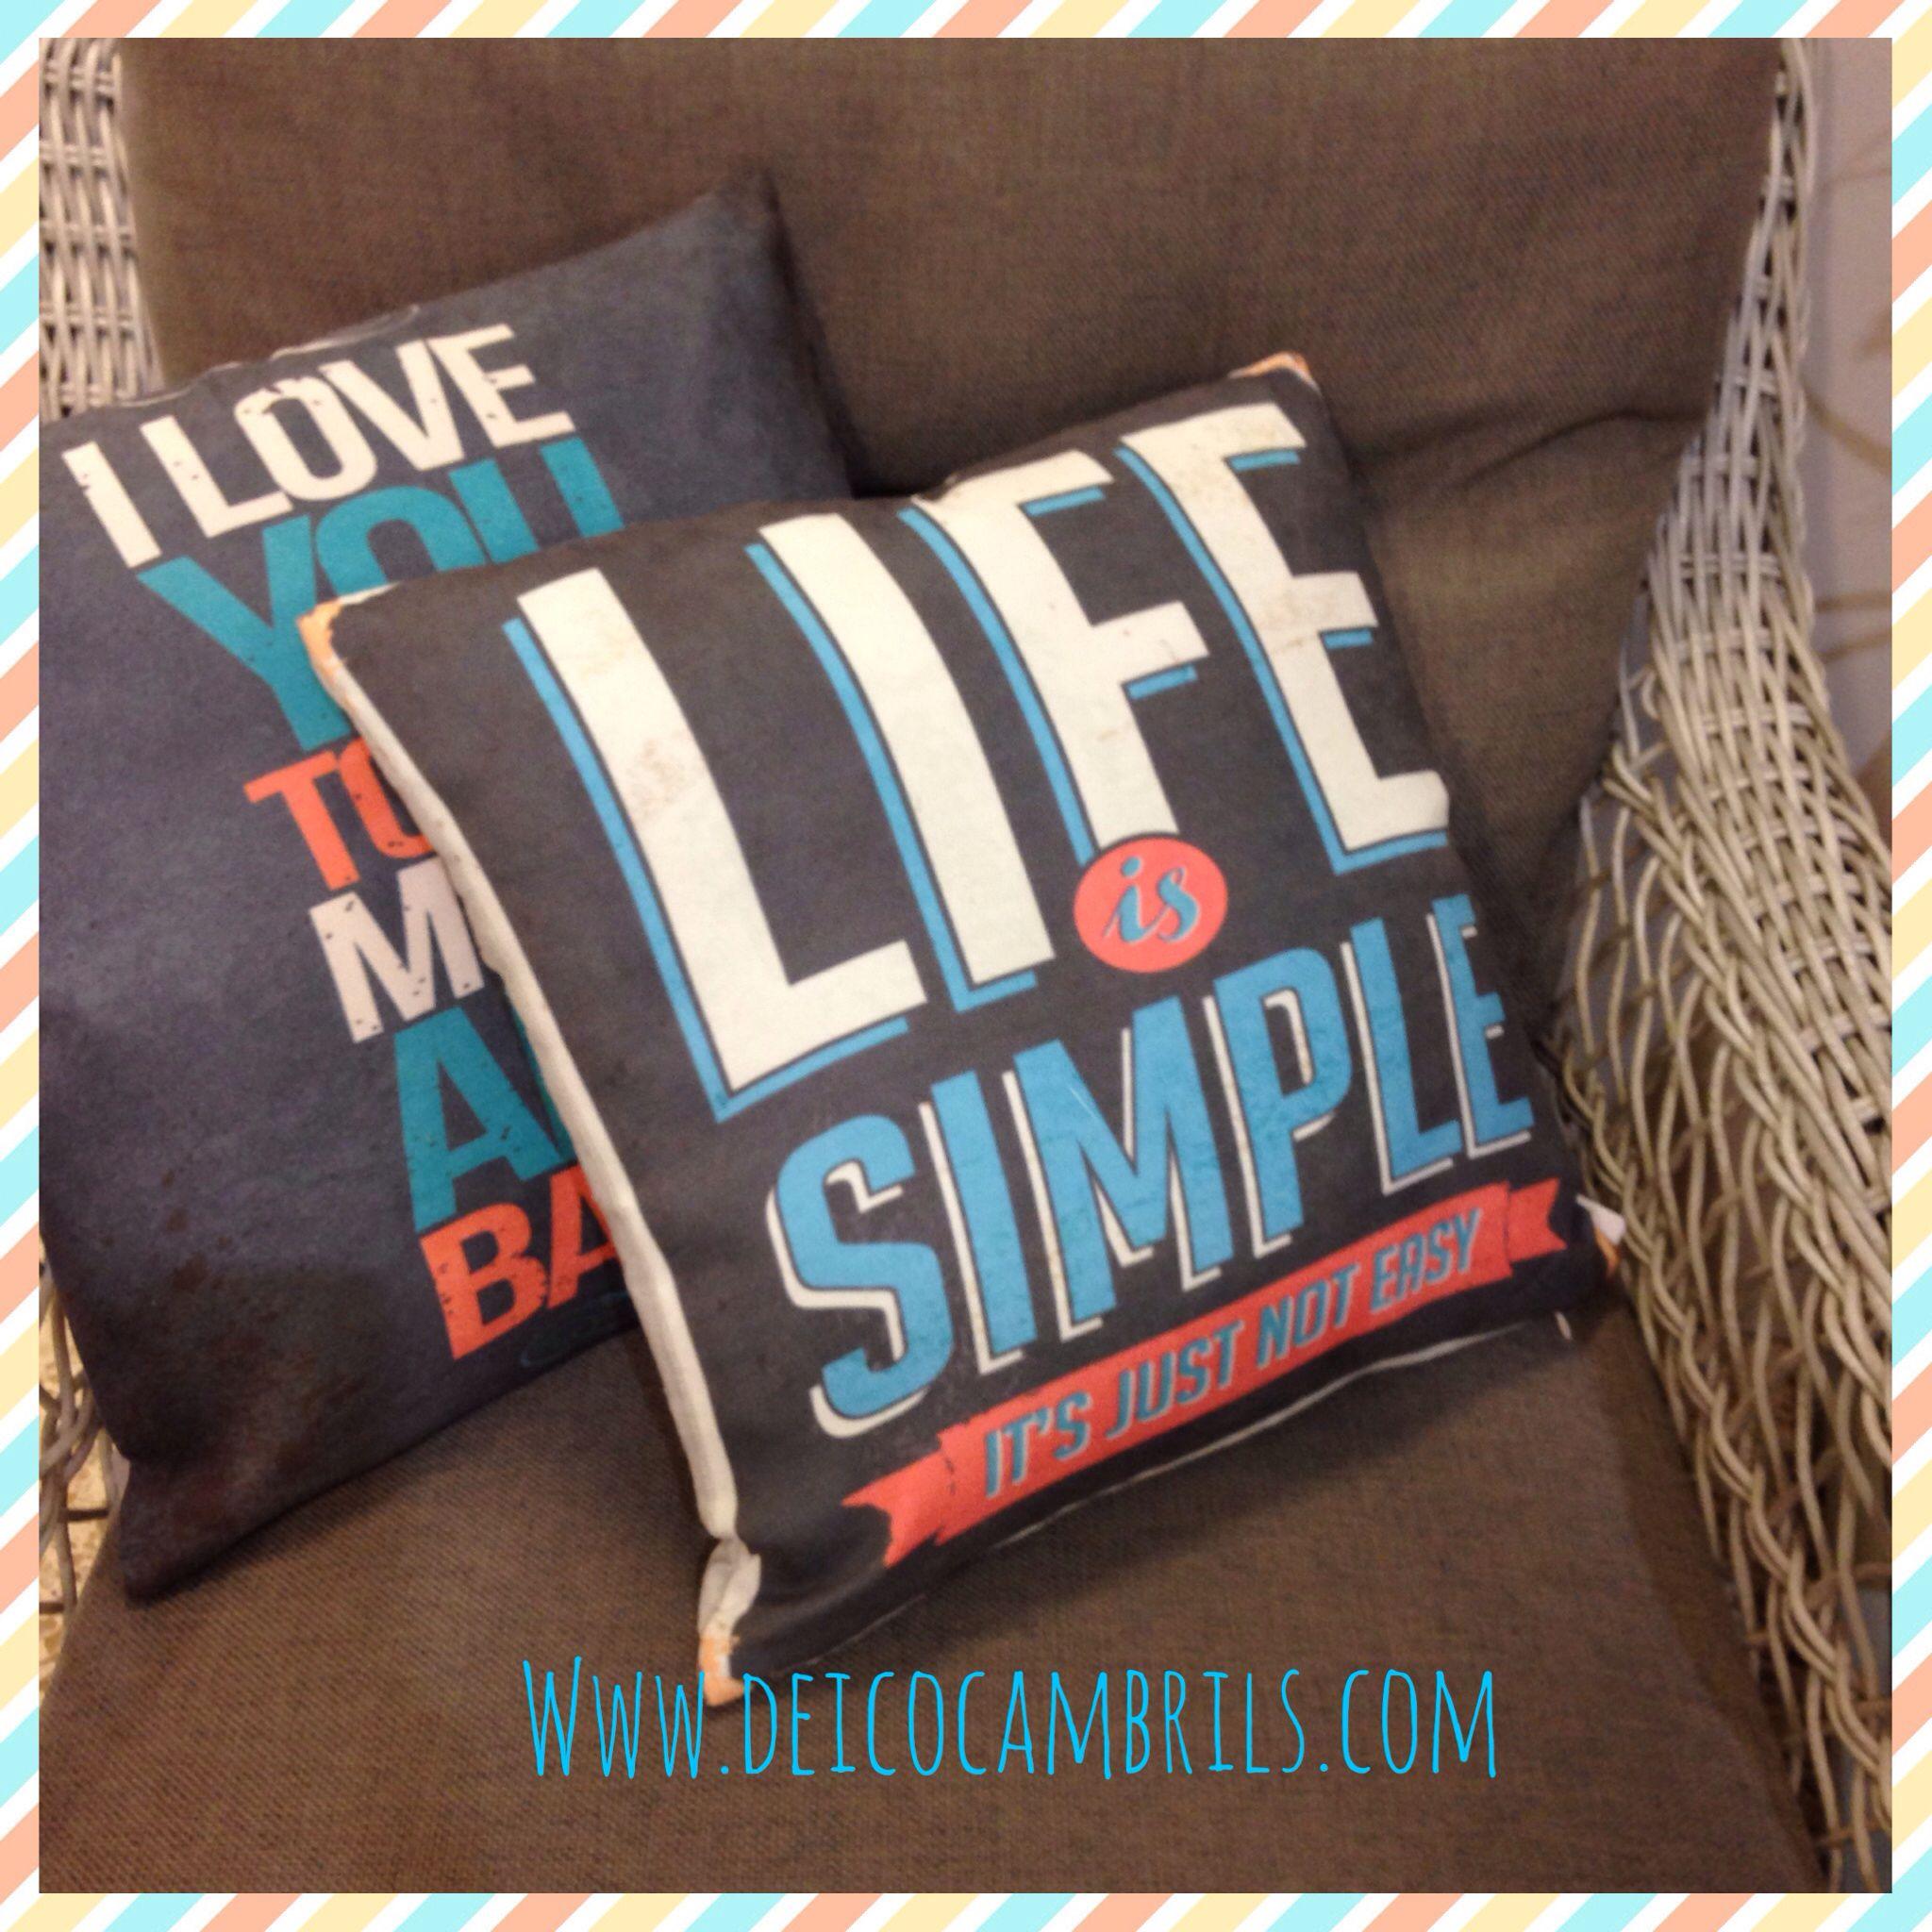 Cojines Con Texto En Muebles Deico Textil Pinterest Textos  # Cojines Para Muebles